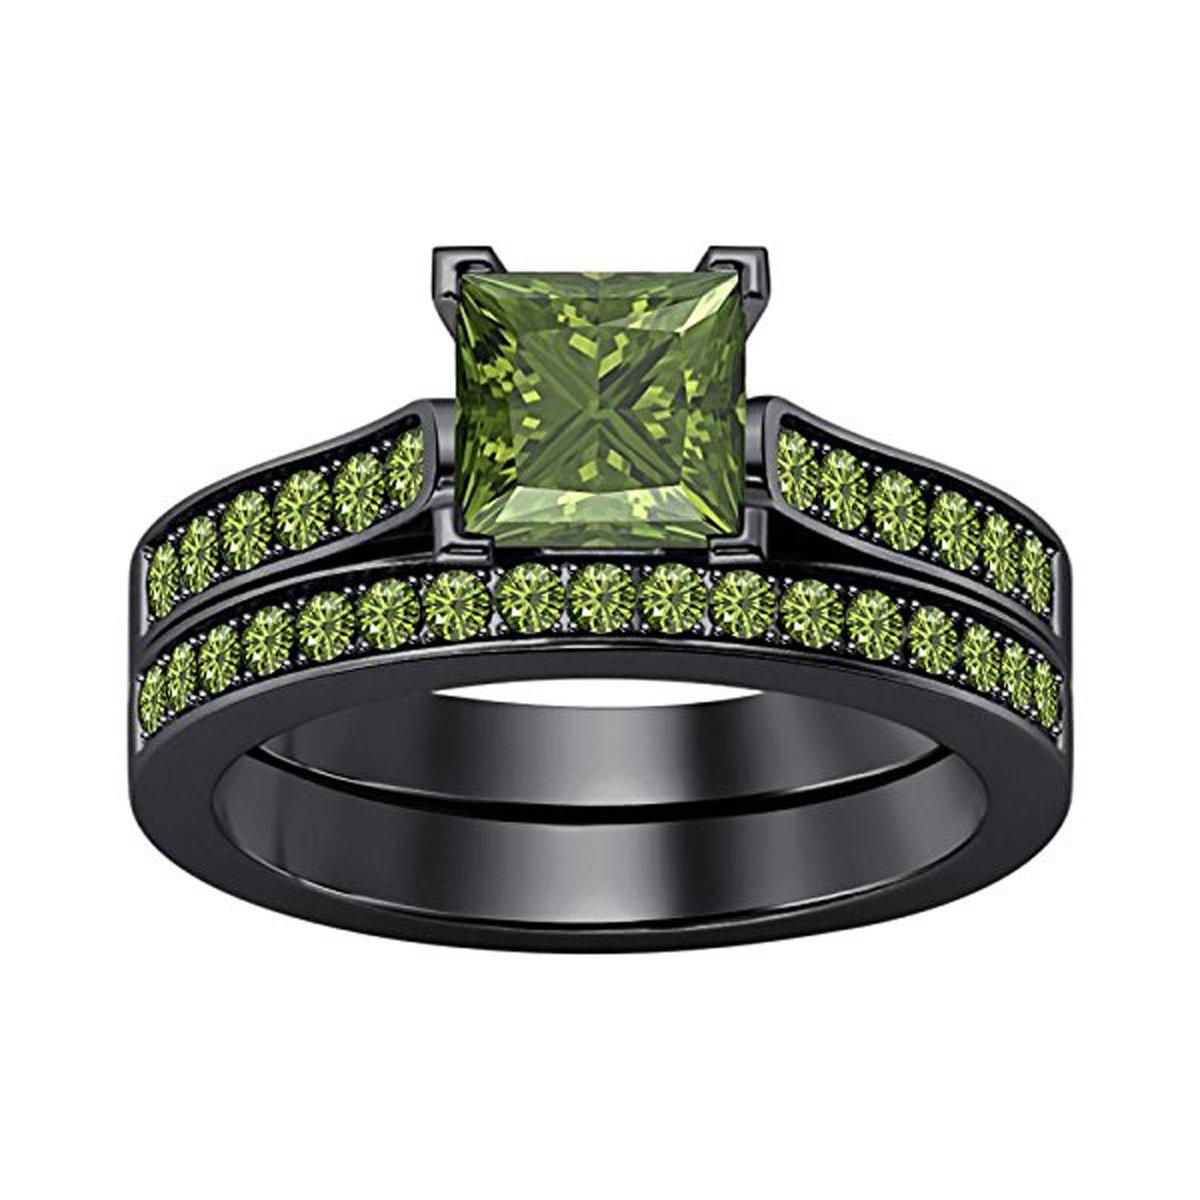 Women's Jewelry 2.75 CT Princess Cut Created Peridot Wedding Band Engagement Bridal Ring Set 14k Gold Plated Alloy Sizes 4-11